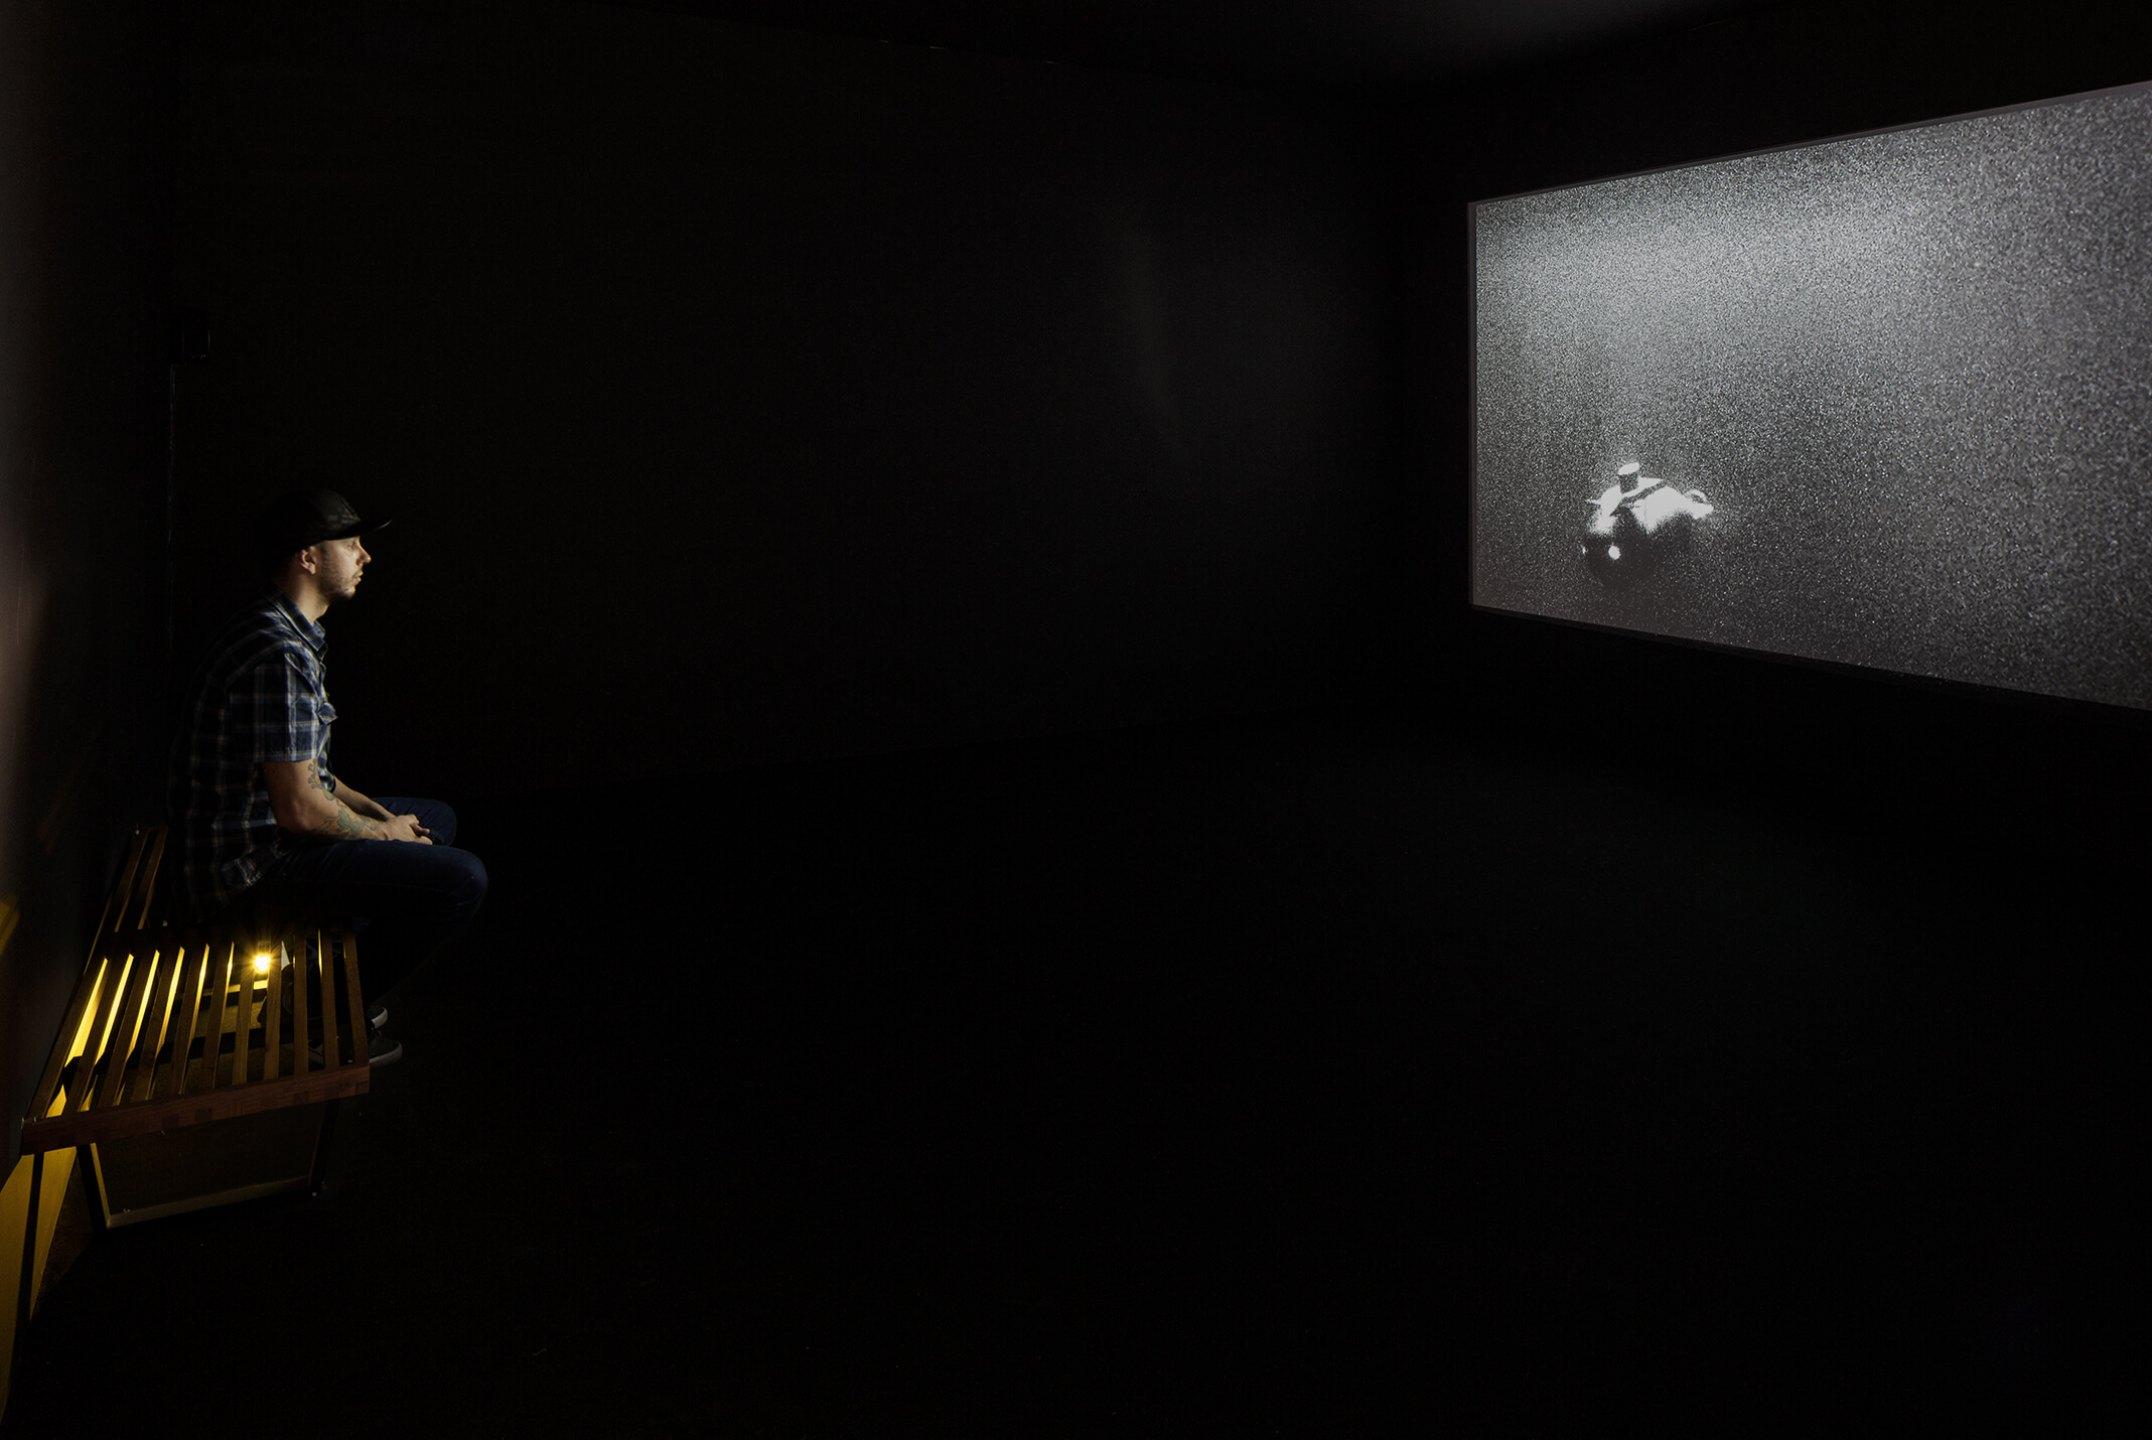 Leticia Ramos, <em>VOSTOK – Screening #1</em>, Mendes Wood DM, São Paulo, 2014 - Mendes Wood DM